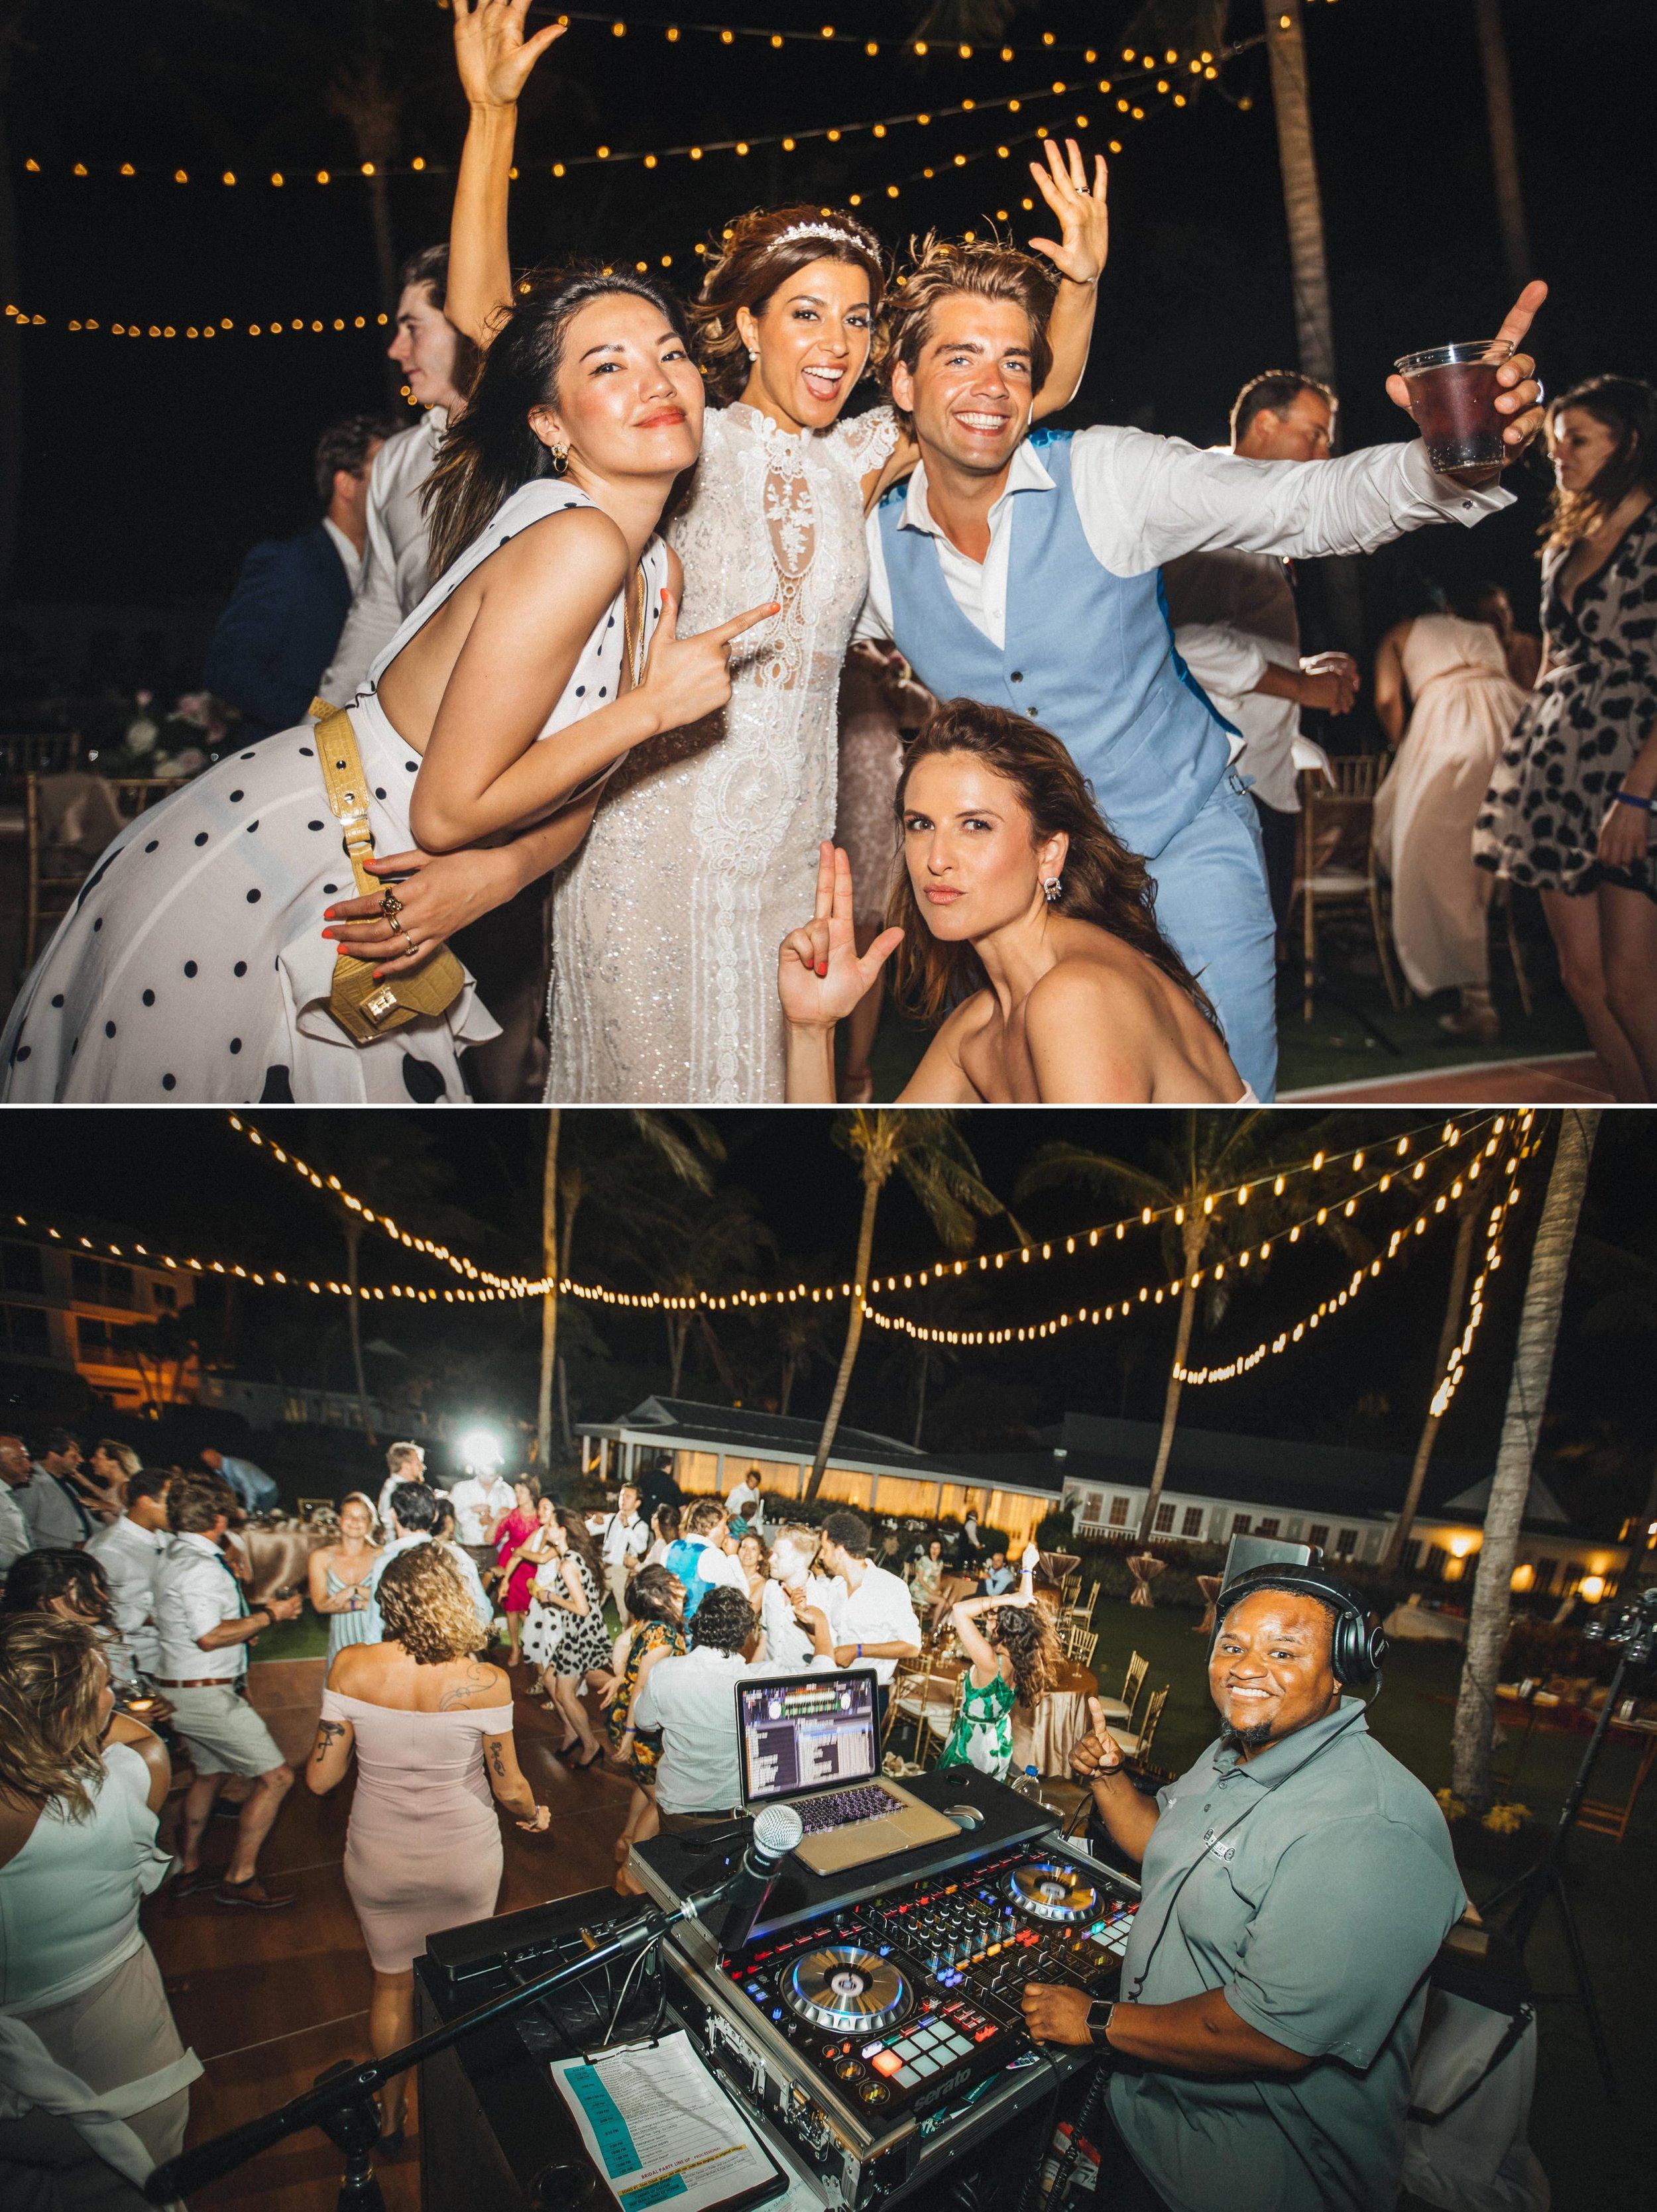 Destination Wedding Photographer - Captiva South Seas Resort Dutch European Luxury Wedding-ShainaDeCiryan.com15.jpg